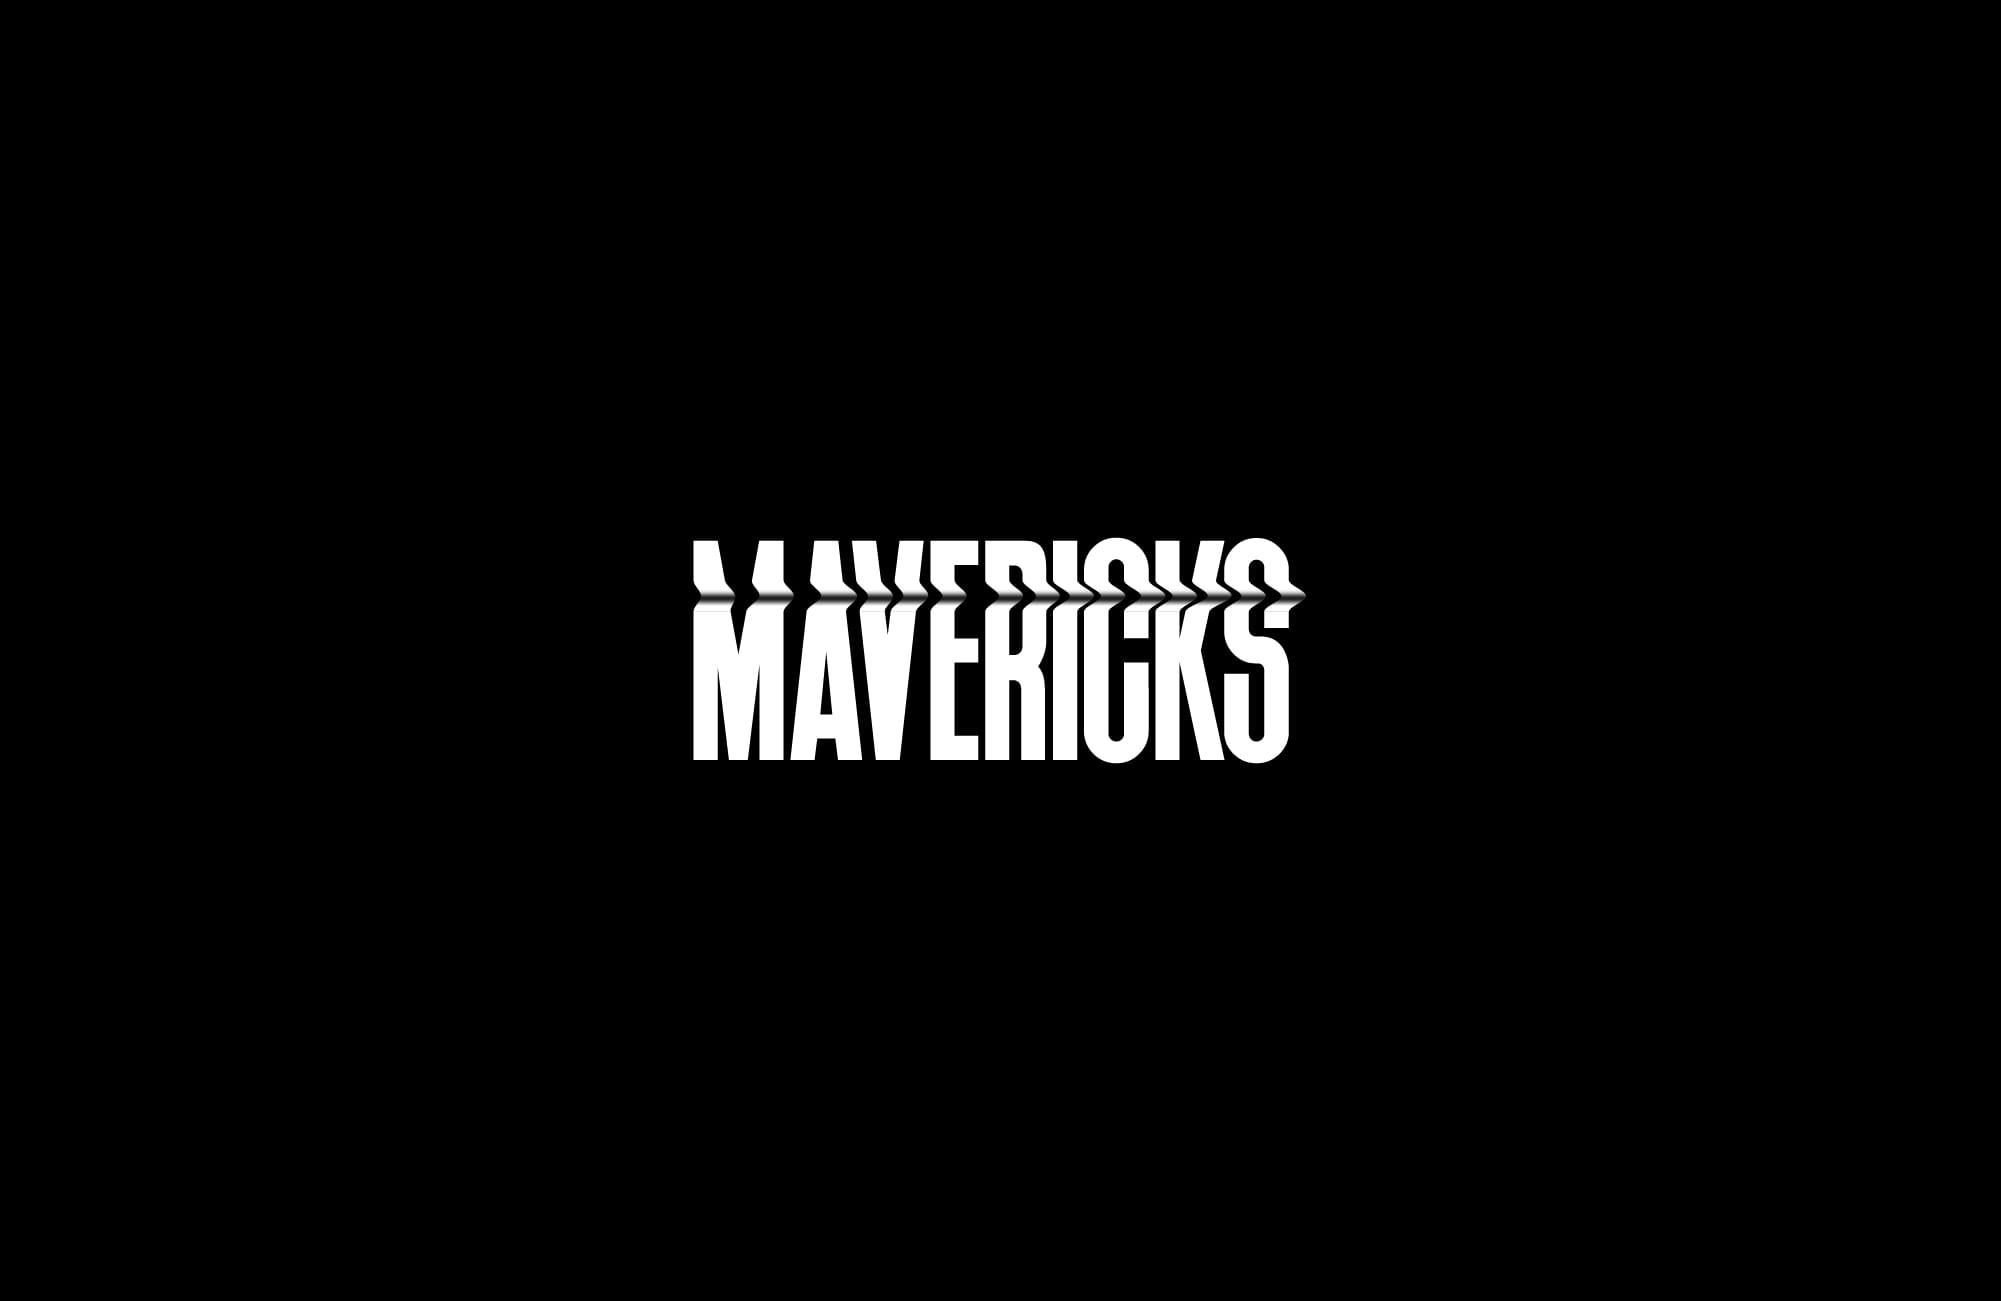 Mavericks 1